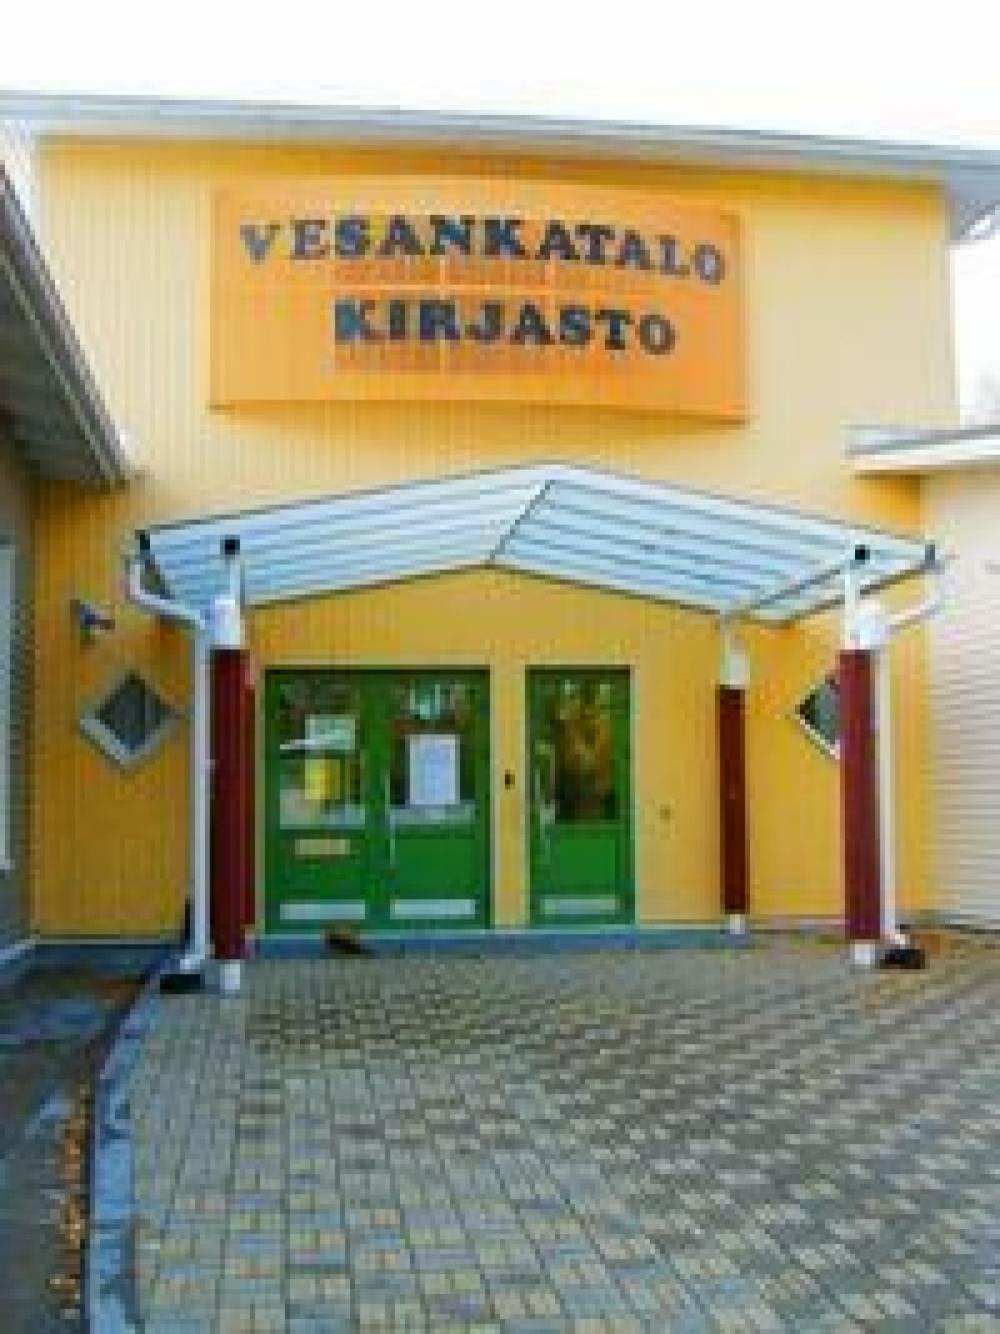 Vesanka Library